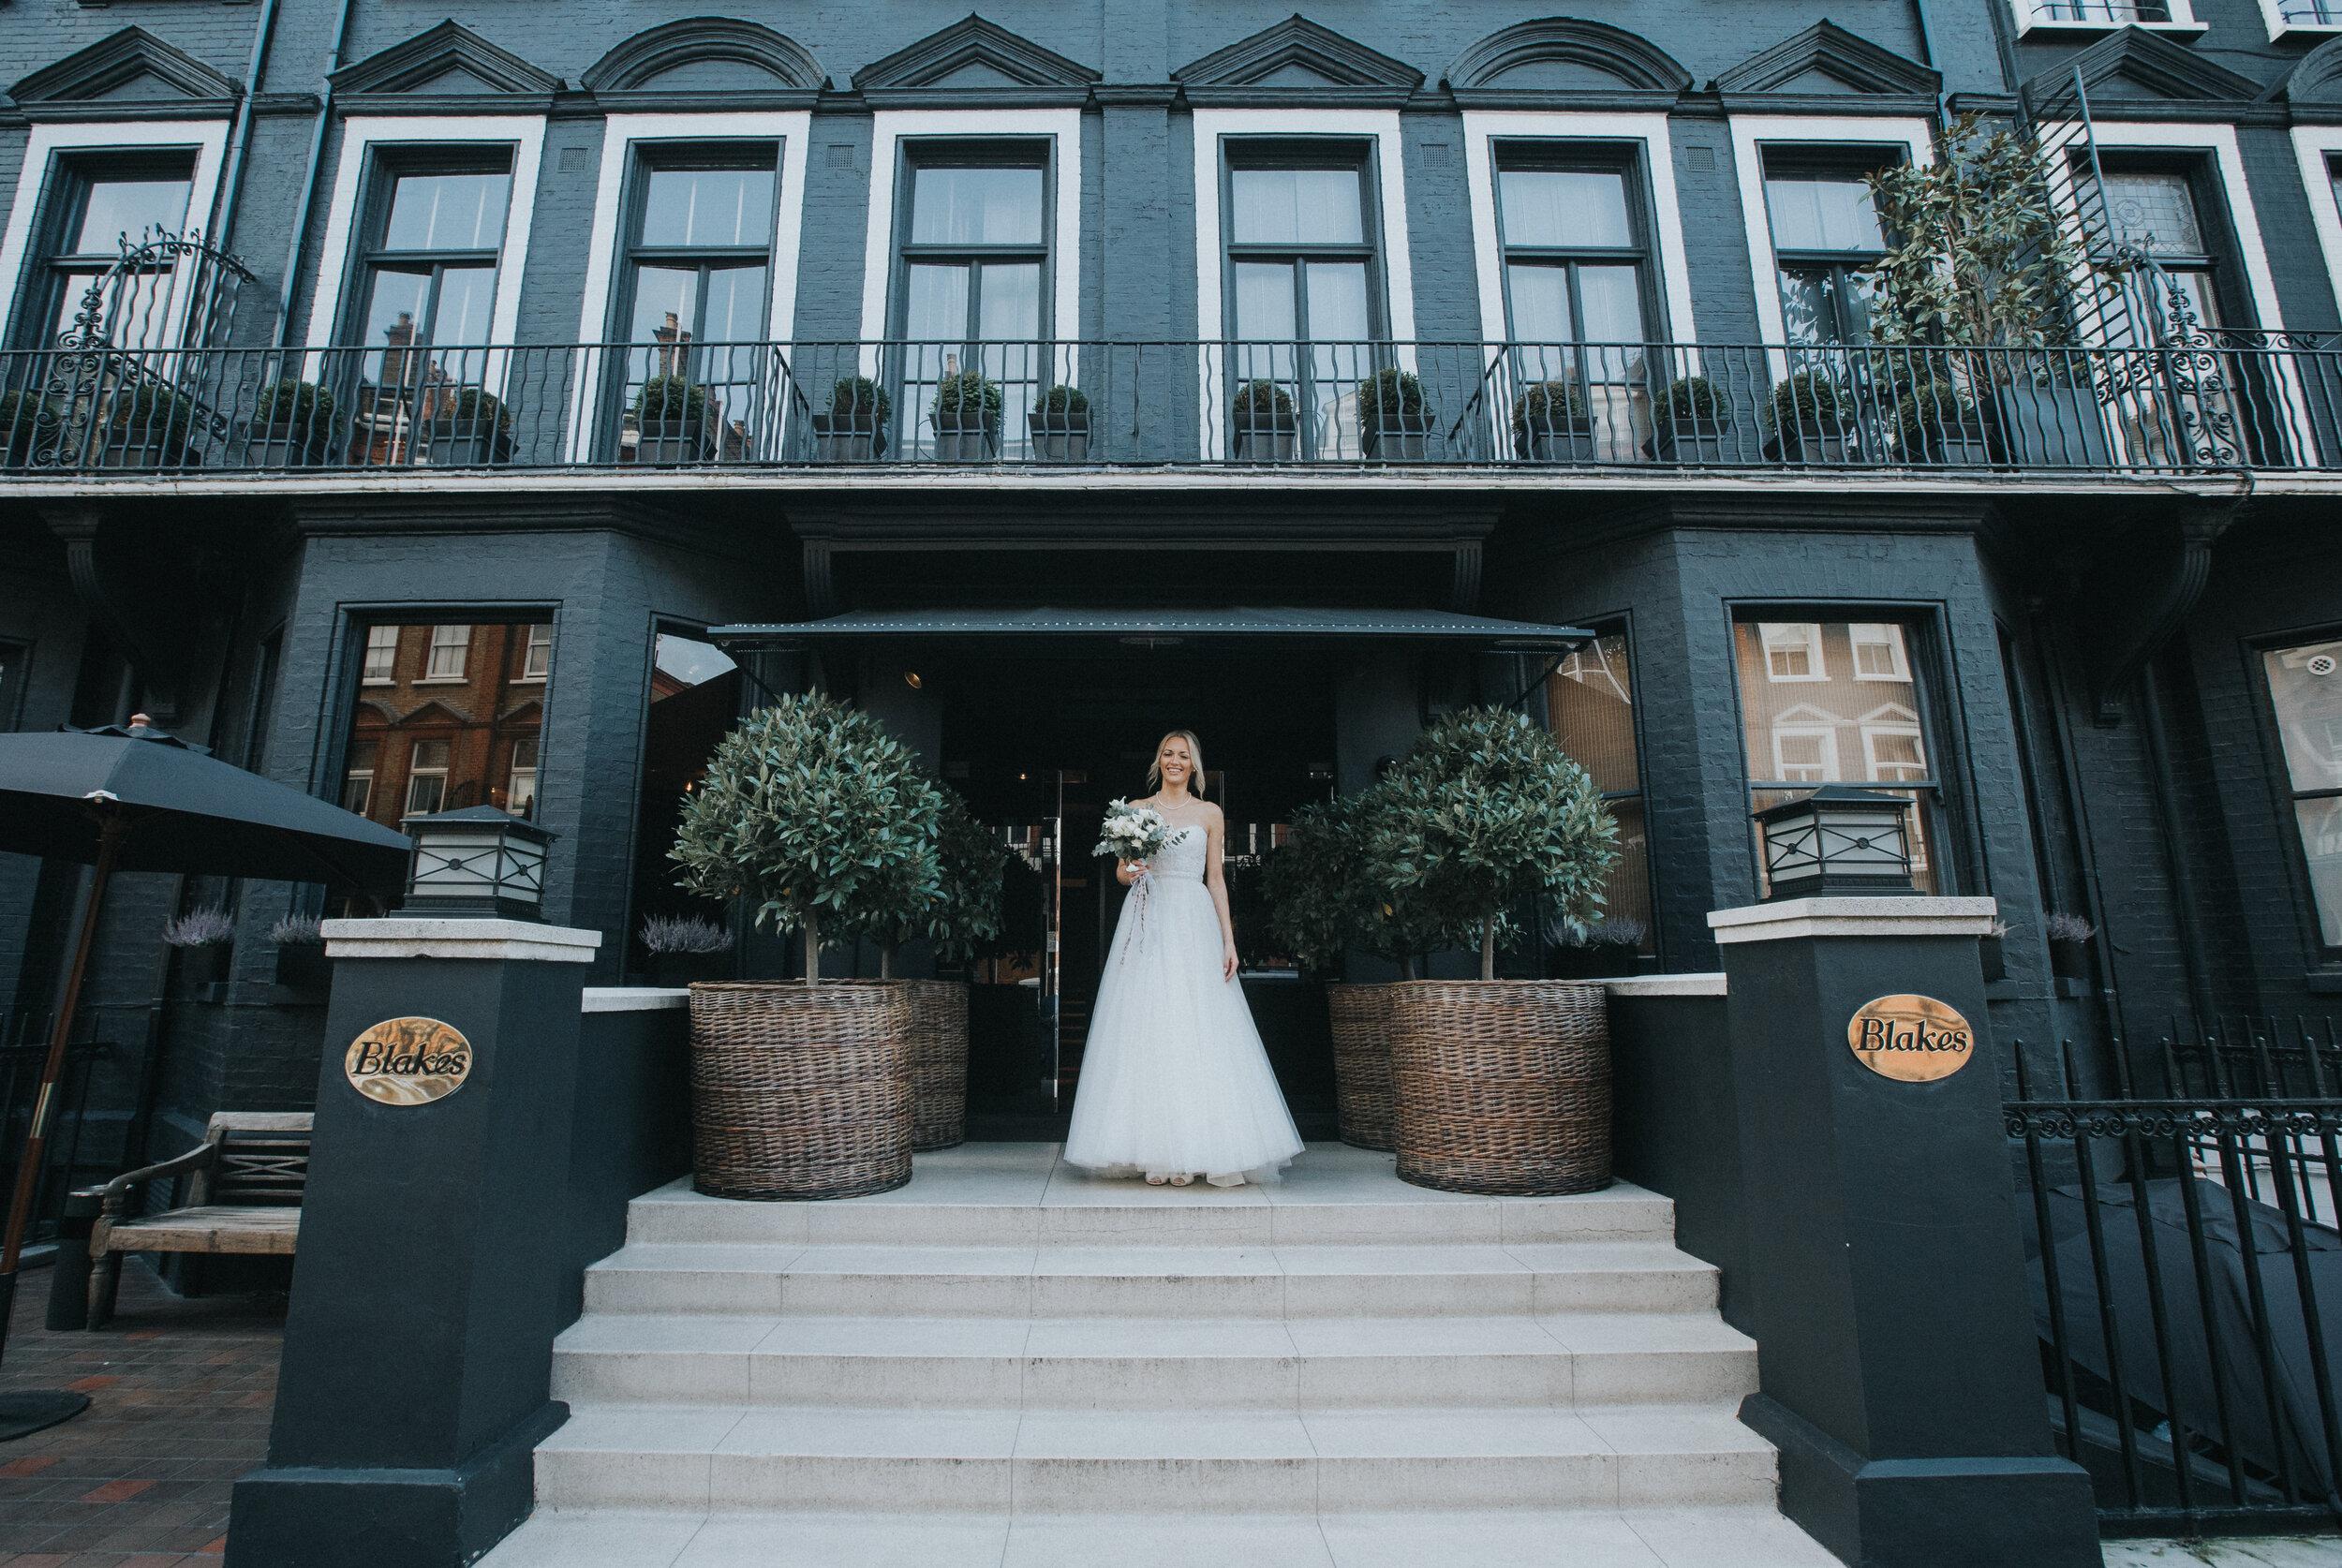 chelsea-london-wedding-photographer-videographer-blakes-hotel-15